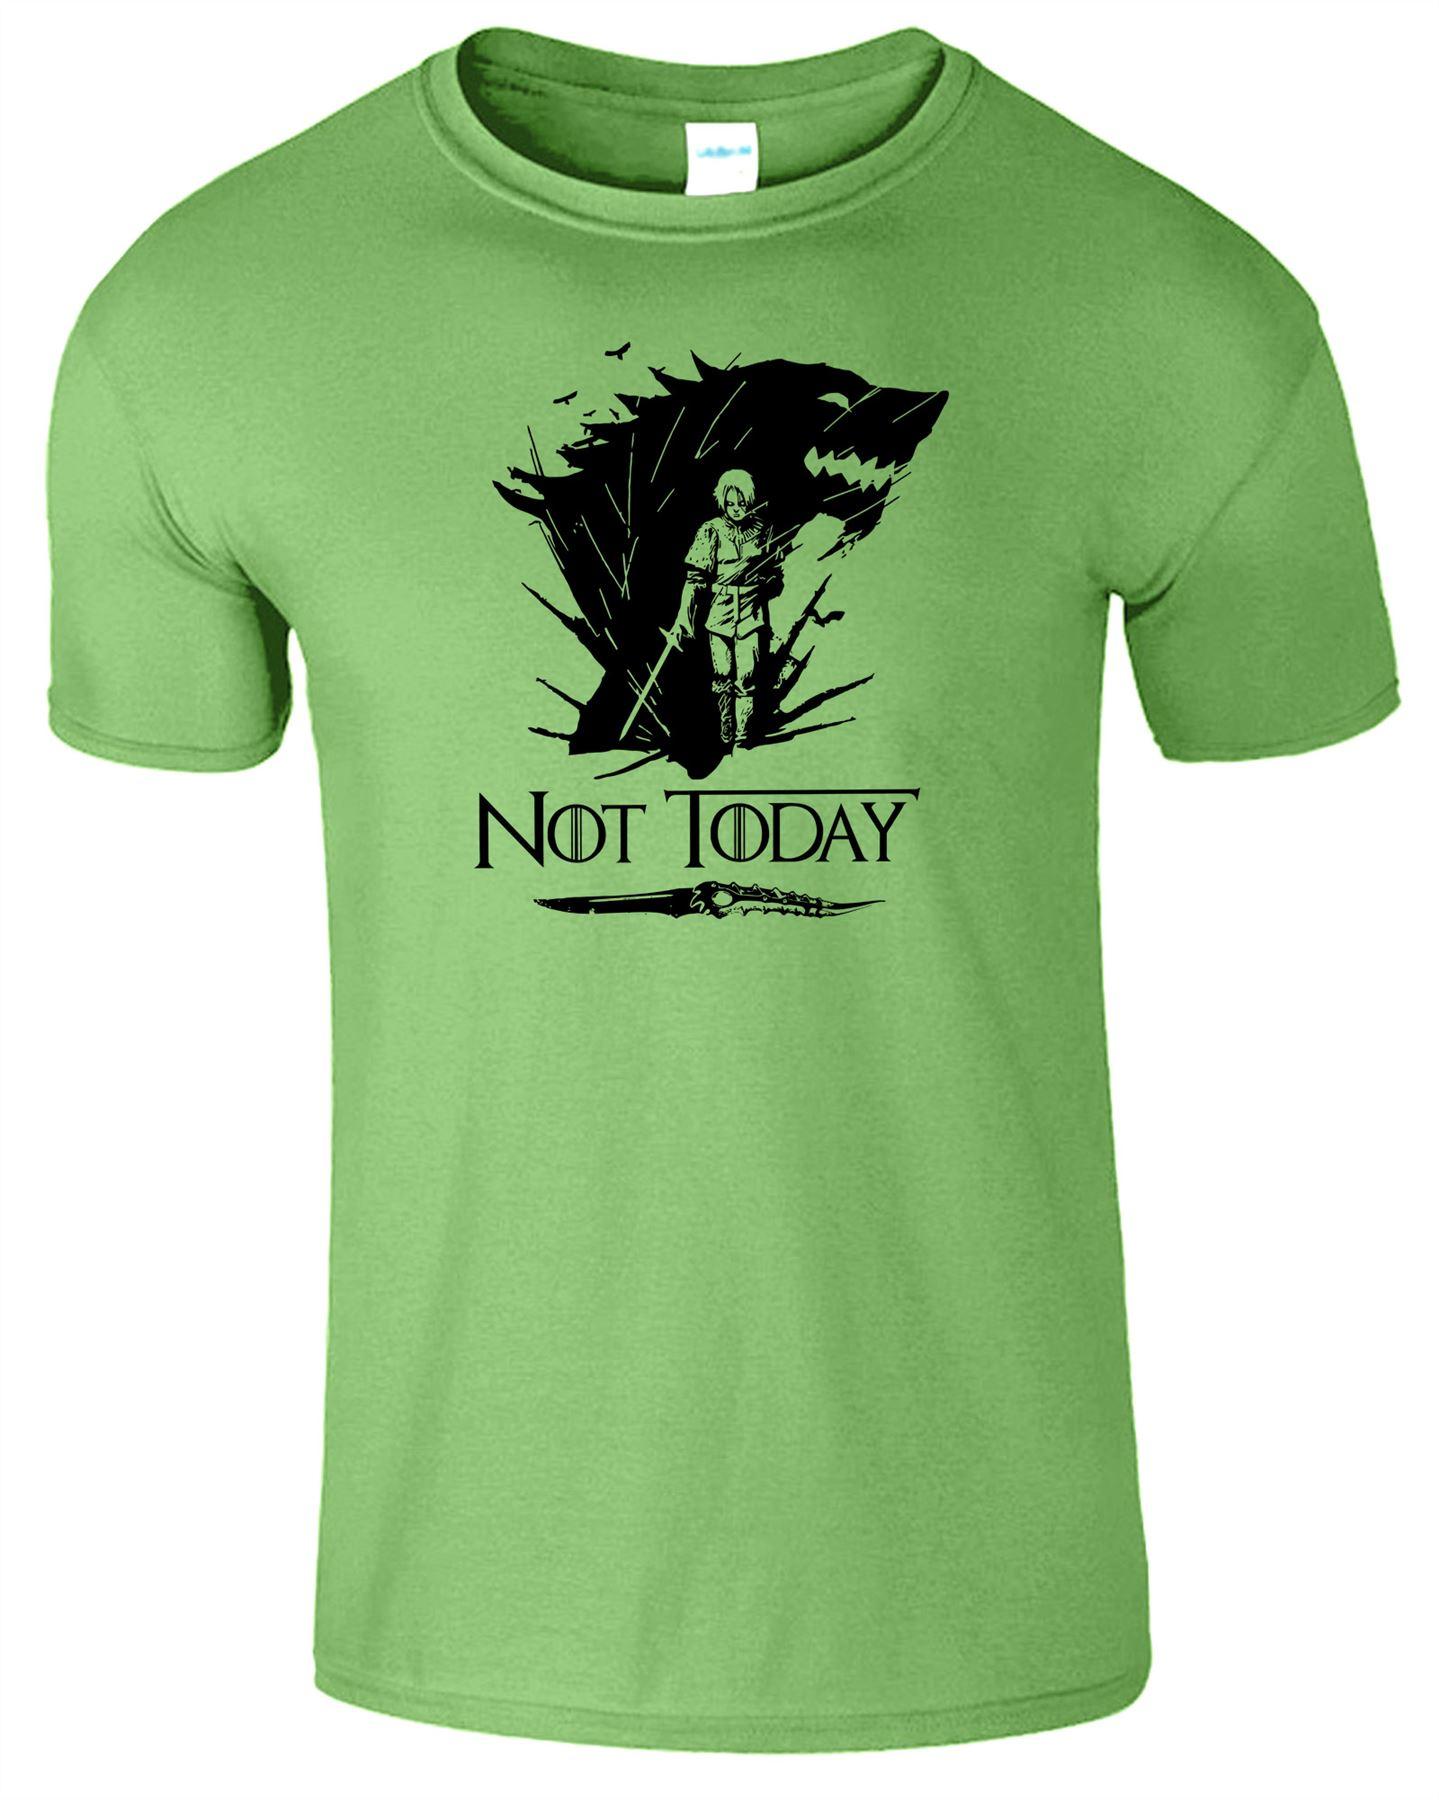 Arya-Stark-Not-Today-T-Shirt-Mens-Game-Season-Womens-Shirt-Adults-Unisex-Fit Indexbild 28